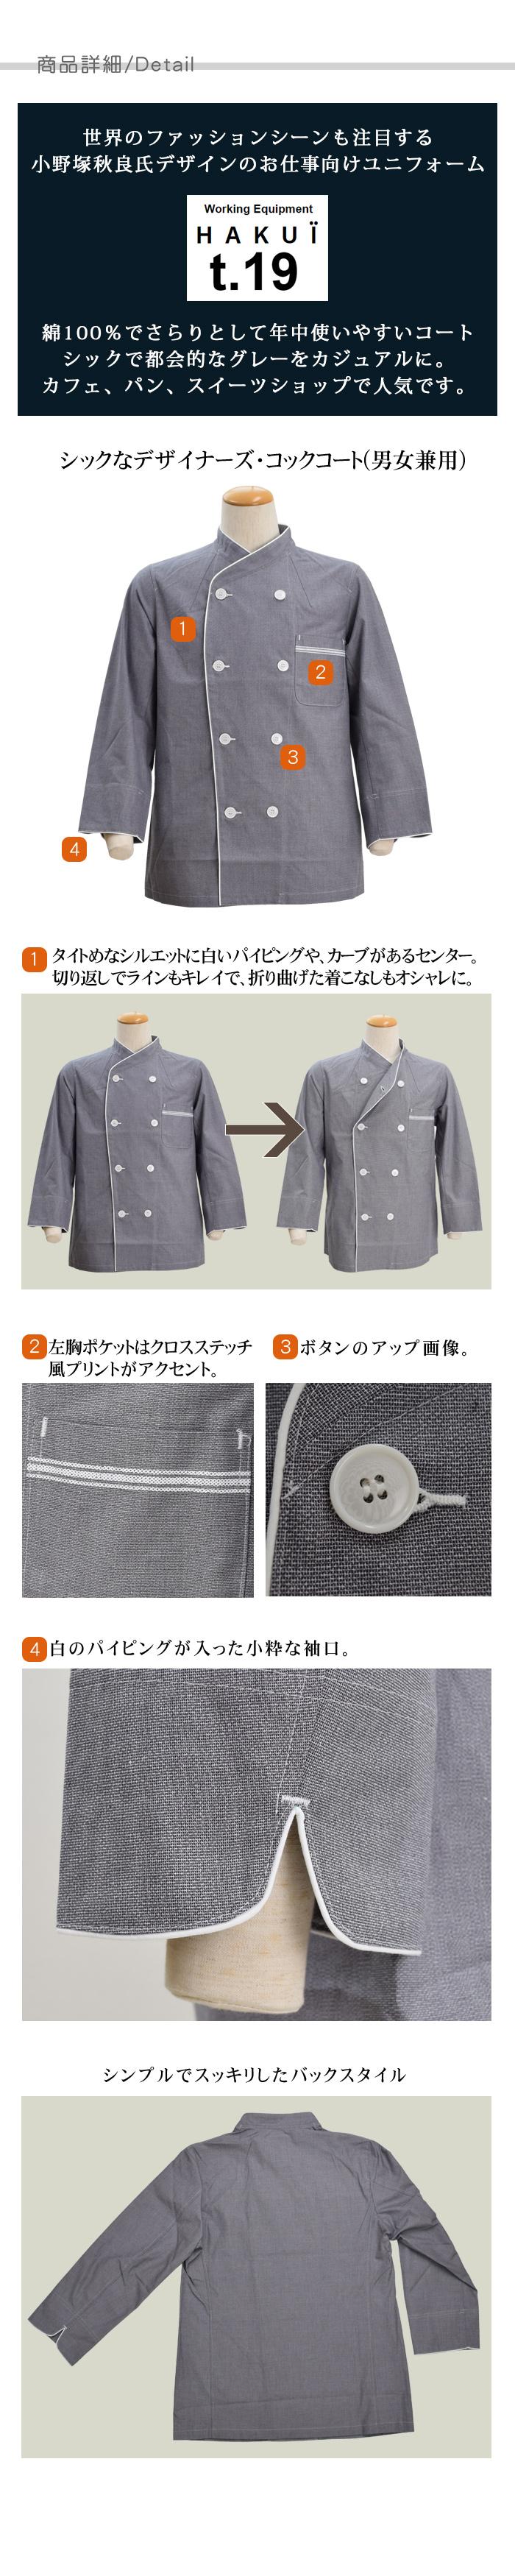 RA6513シックなグレーの長袖コックコート(男女兼用) [レストラン飲食店業務用制服] 詳細説明